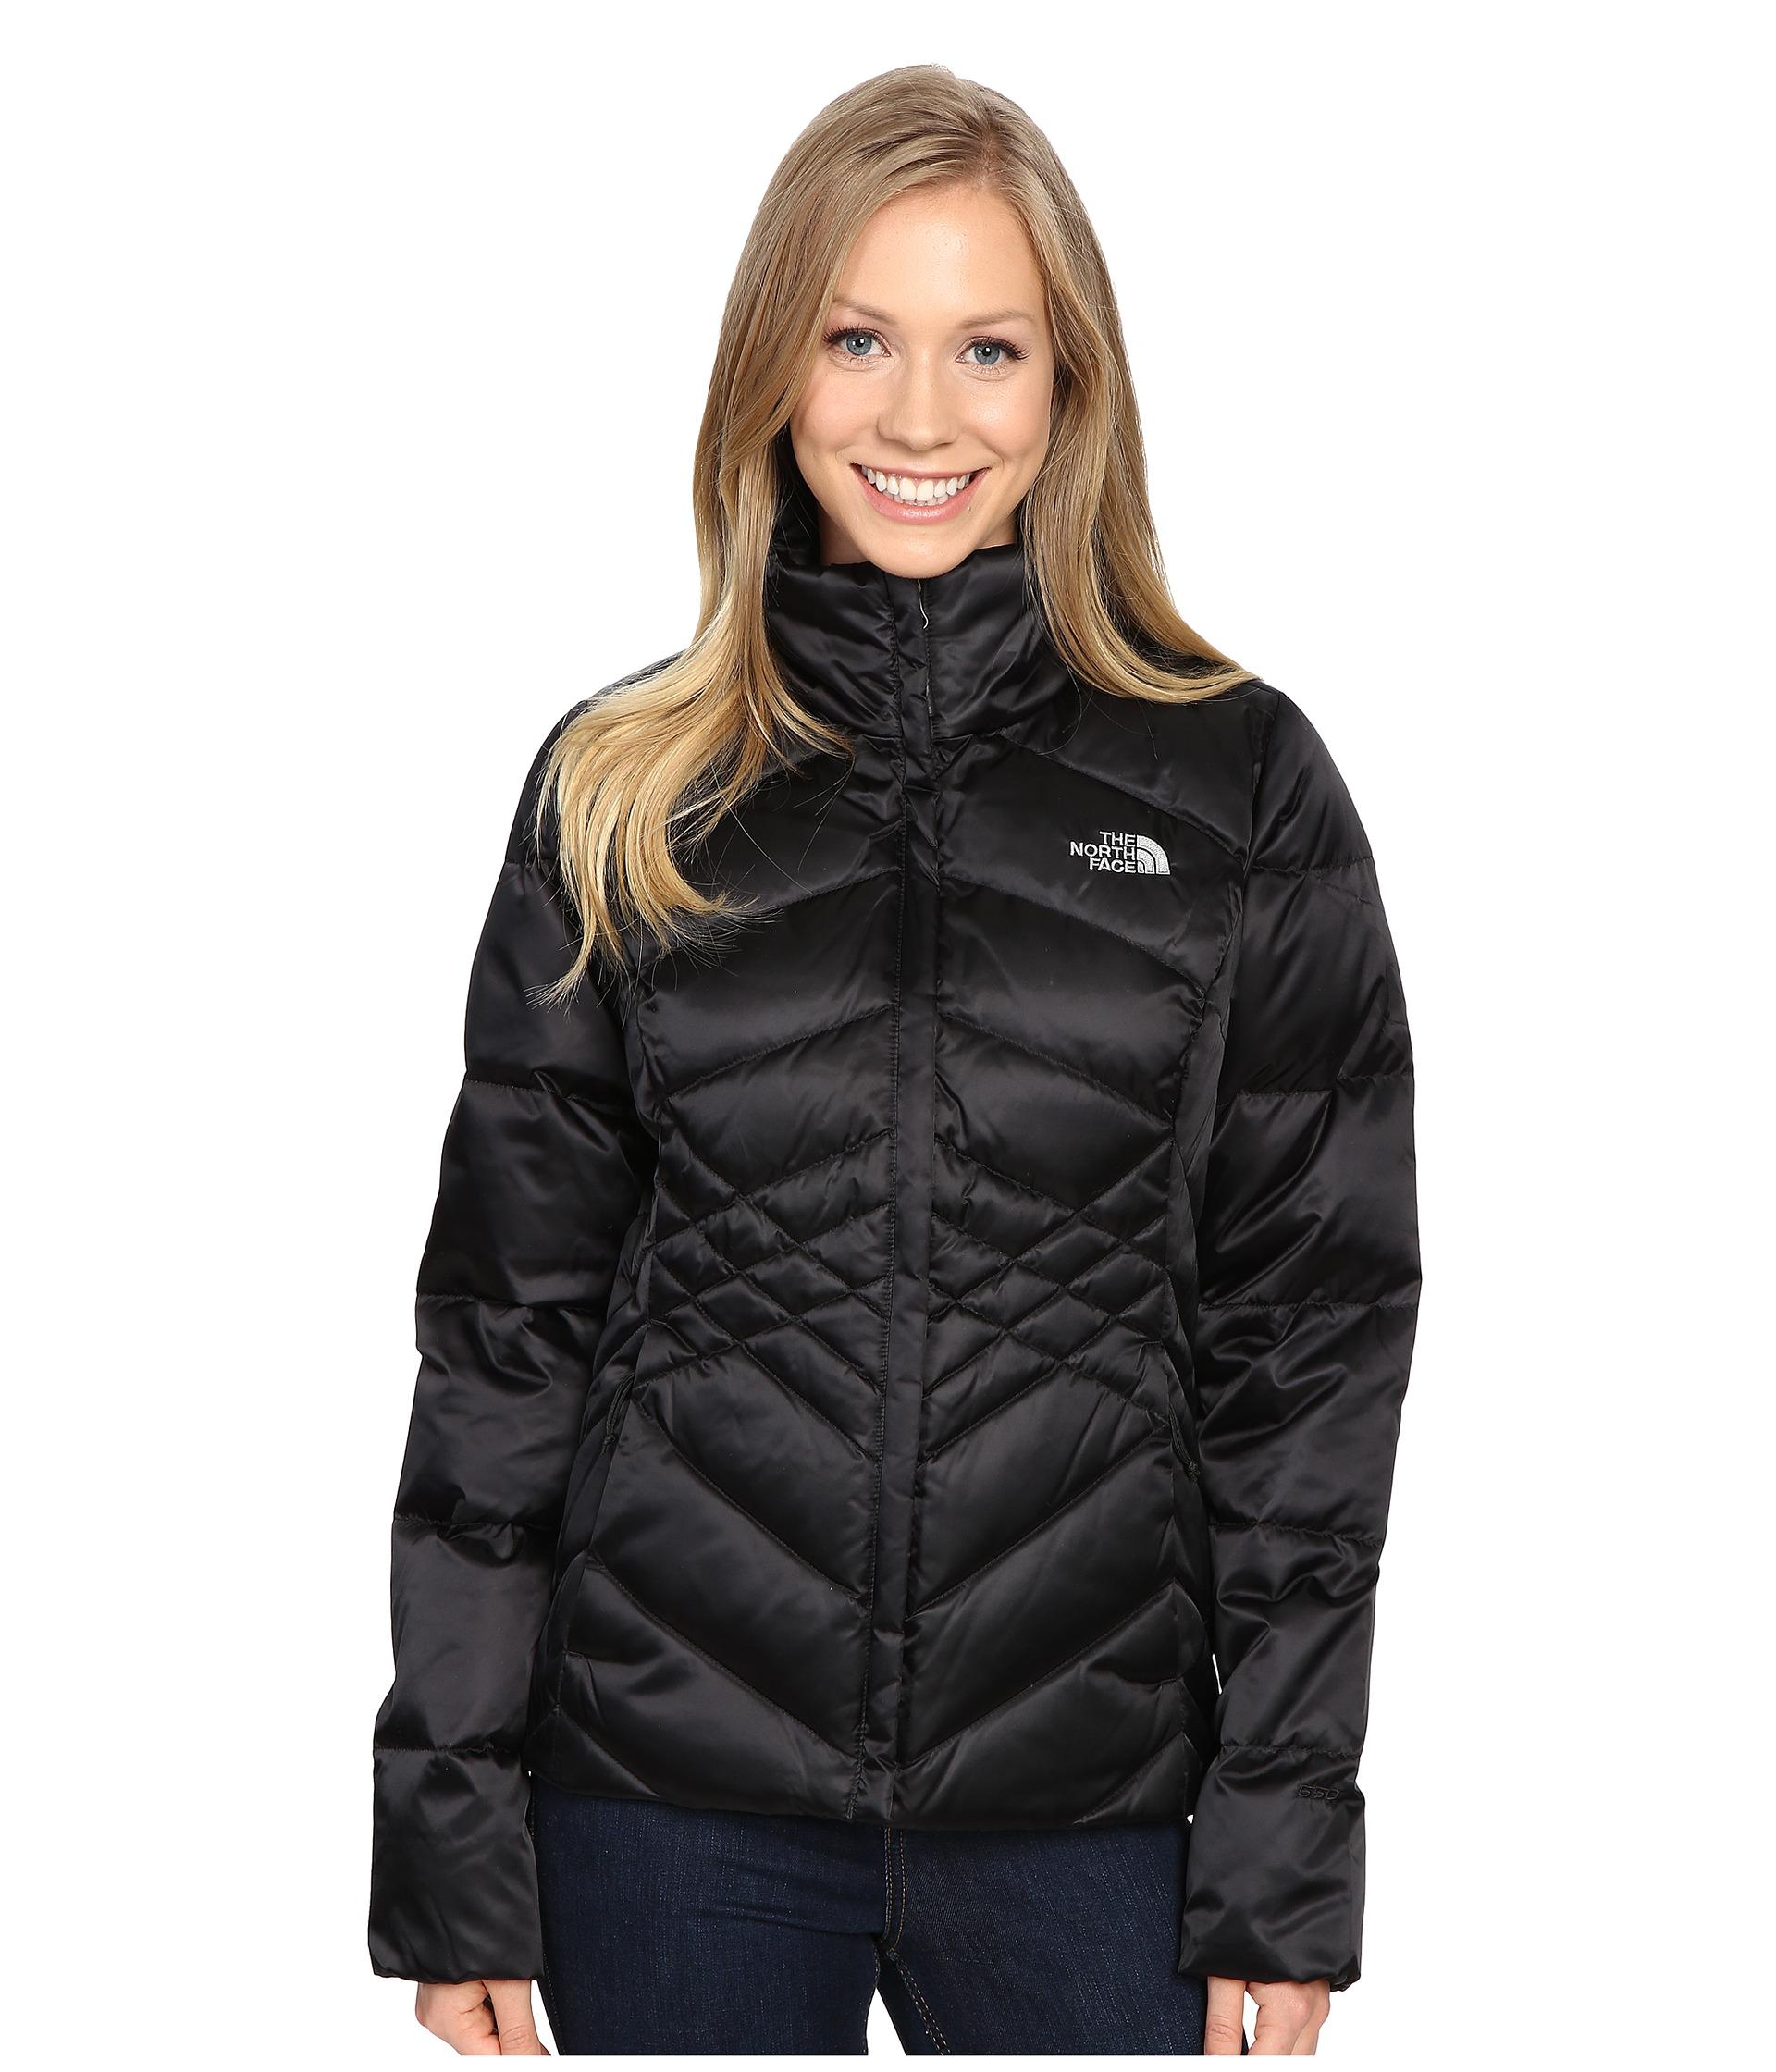 North Face Schoudertasje : The north face aconcagua jacket tnf black zappos